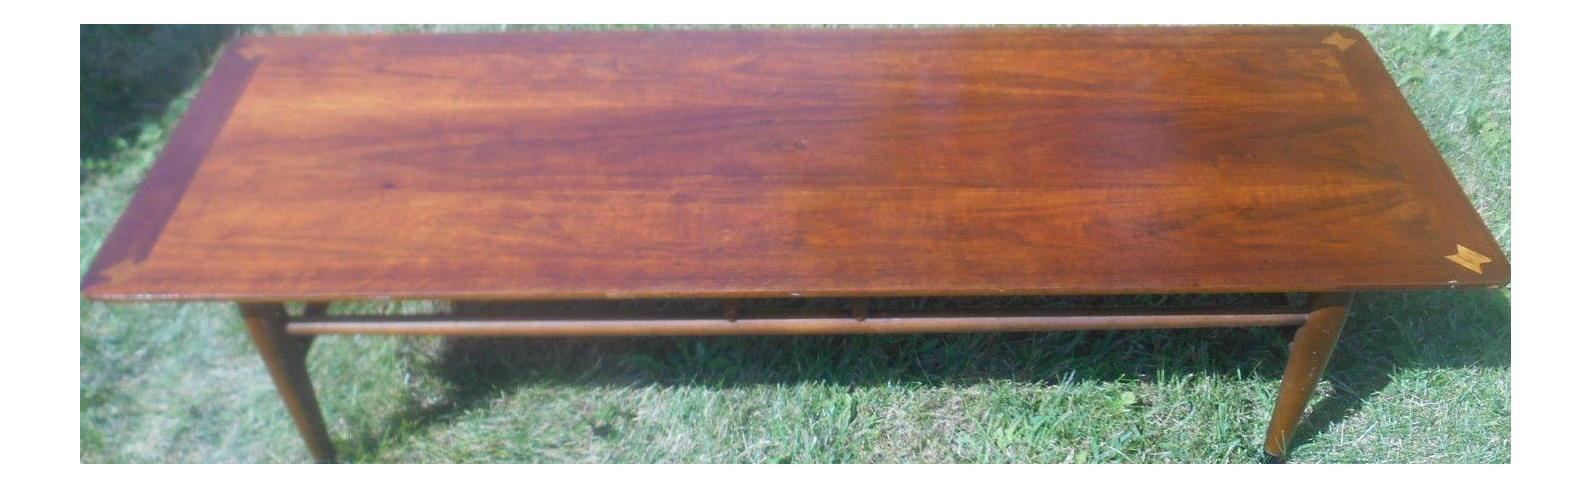 1960s Vintage Lane Walnut Surfboard Coffee Table